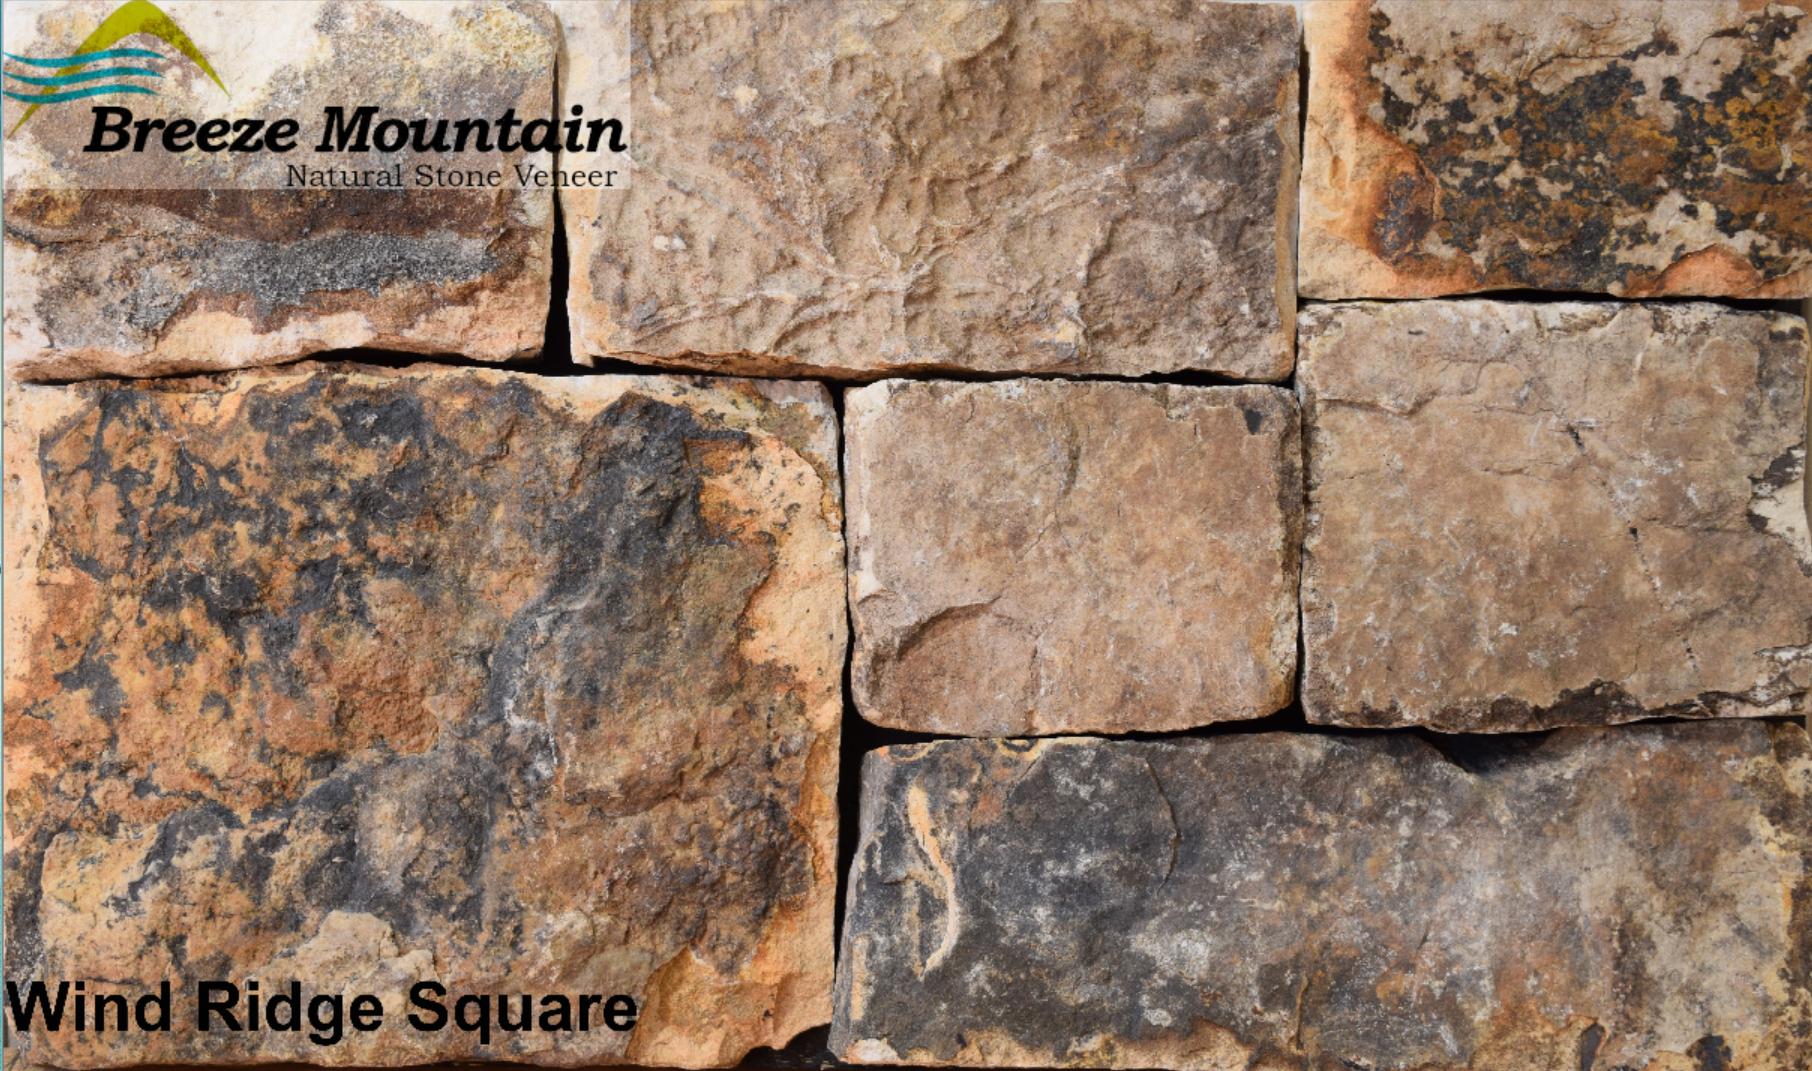 Breeze Mountain Natural Stone Veneer